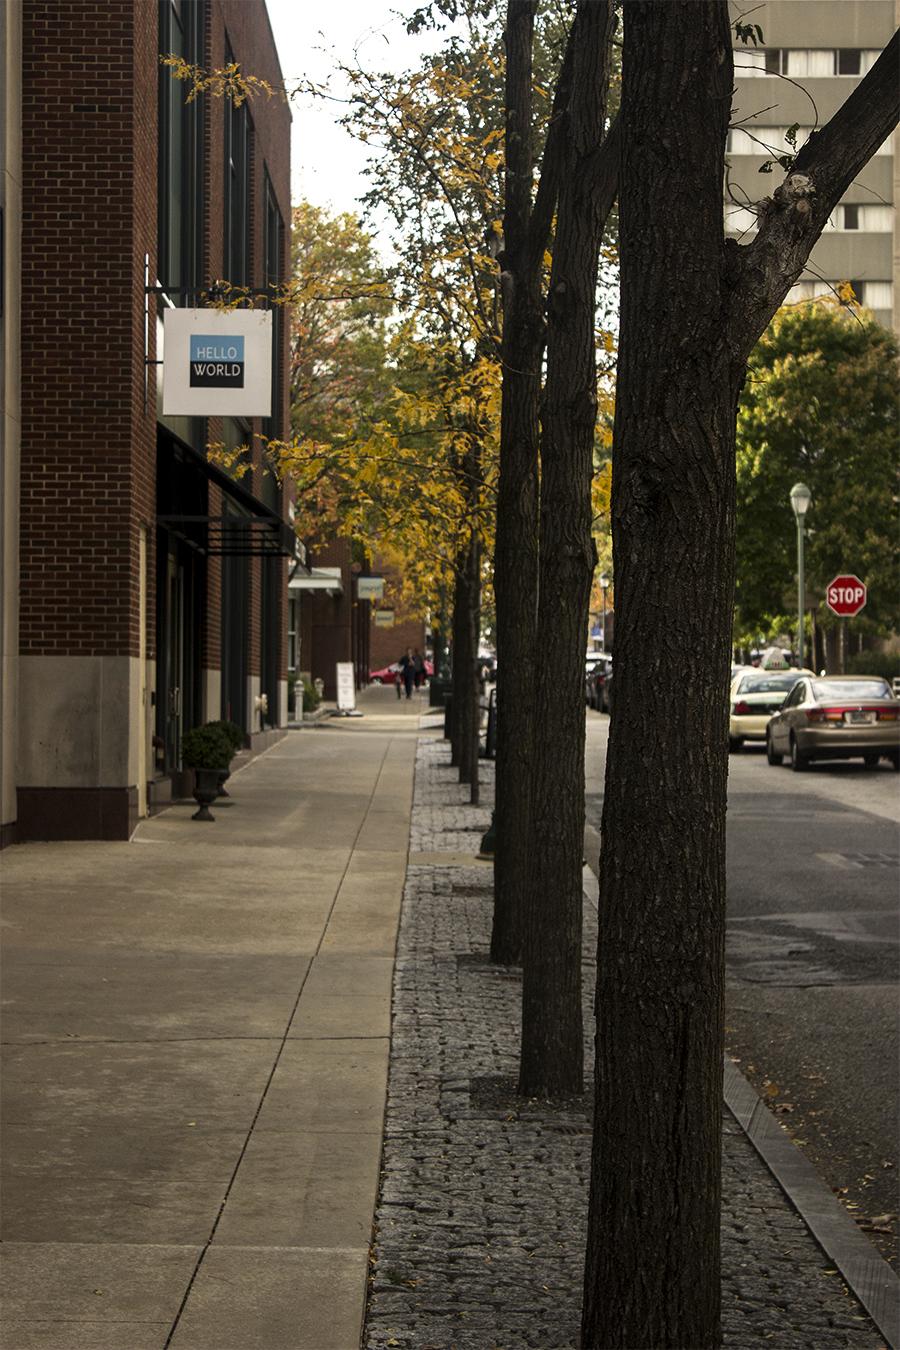 Yash Killa_StillLife_Philadelphia_Pattern_Repetition_Trees_Pavement_streets